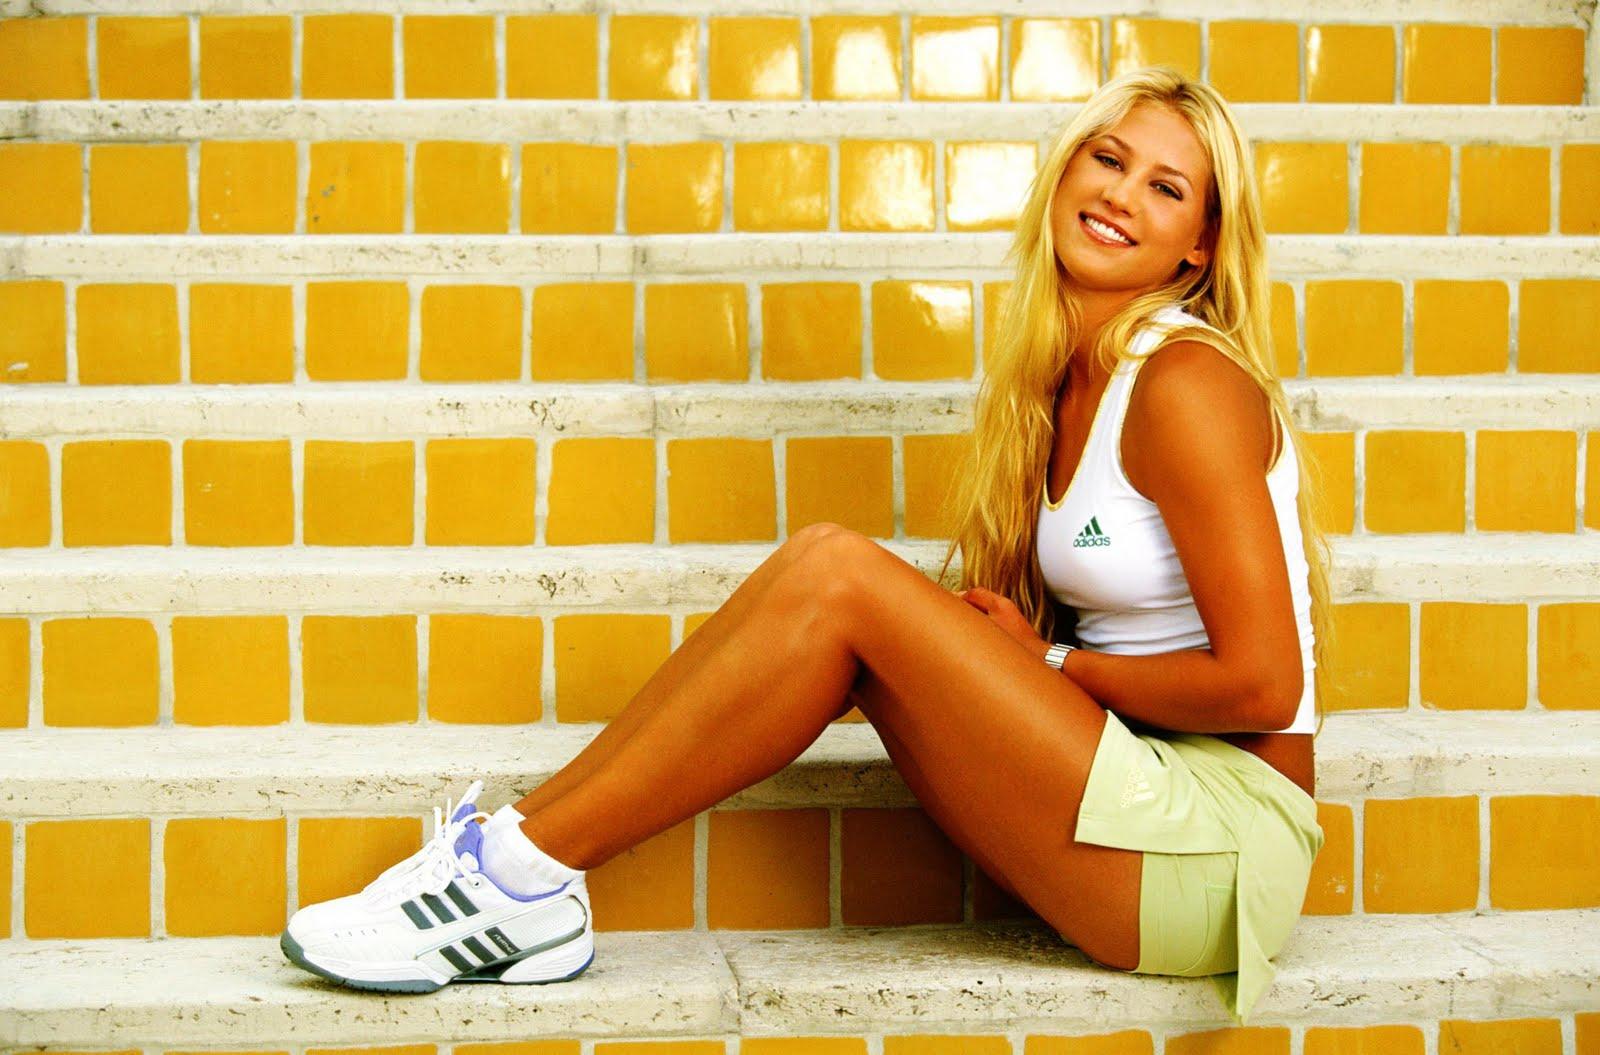 http://1.bp.blogspot.com/-Y5QbSYPtD7A/Tbg-rb2Ex8I/AAAAAAAAAUQ/4Pop-a_9J2M/s1600/Anna+Kournikova+-+Adidas+Photoshoot+2003+%25282%2529.jpg